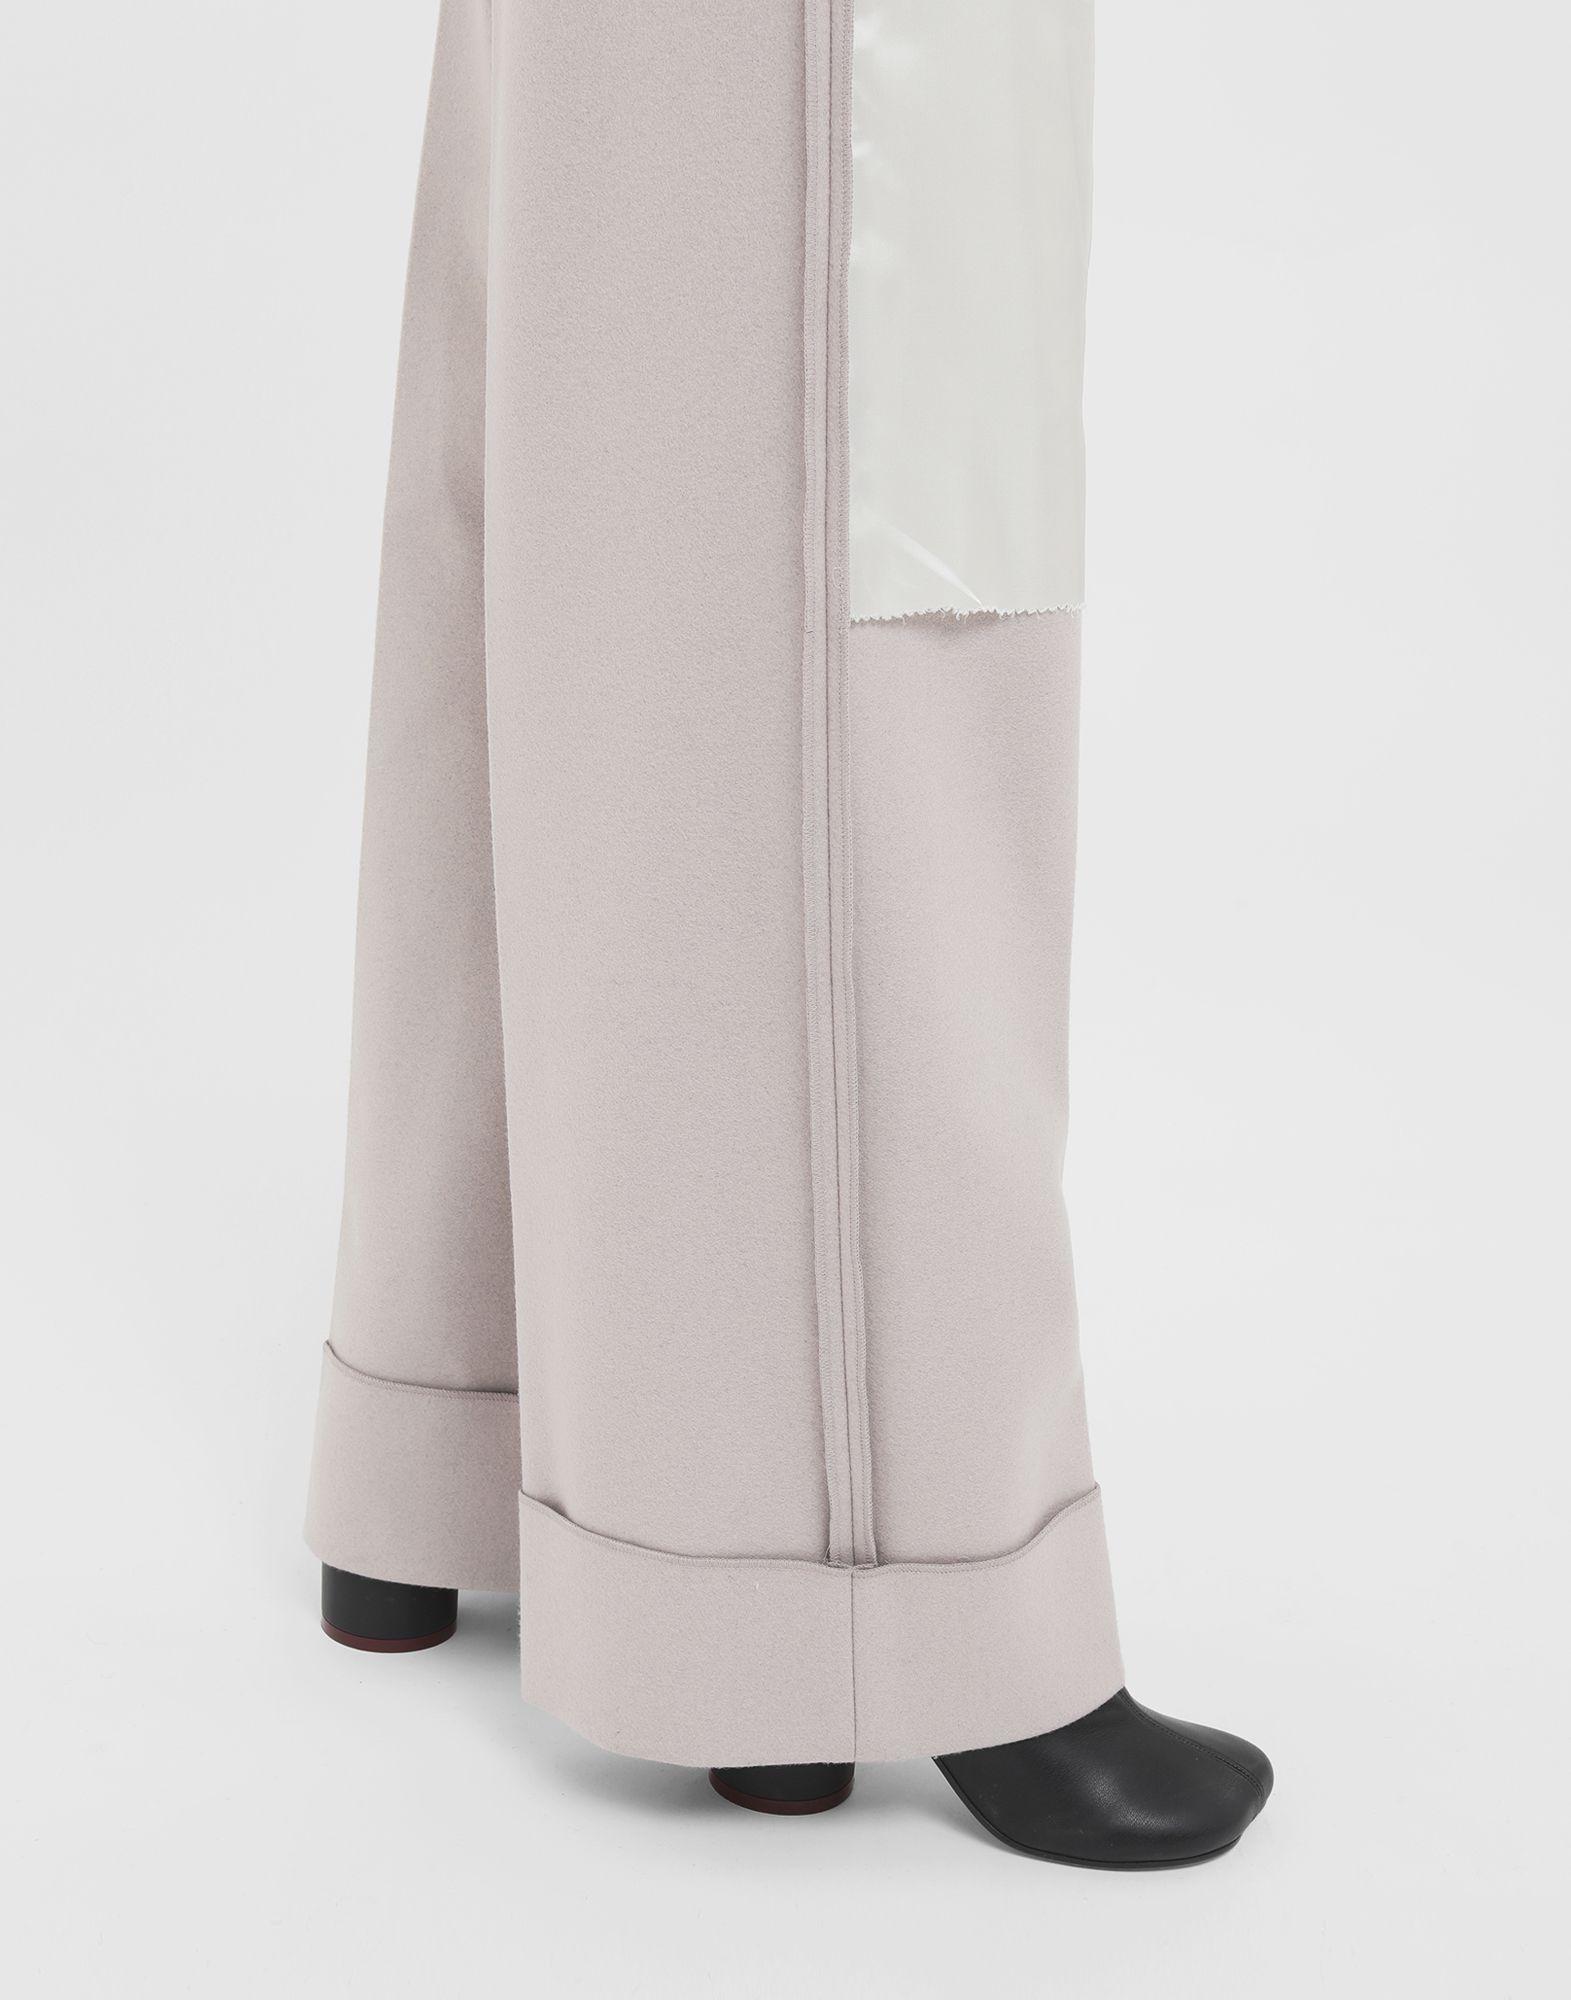 MM6 MAISON MARGIELA Pantaloni sartoriali Reversed Pantalone Donna b